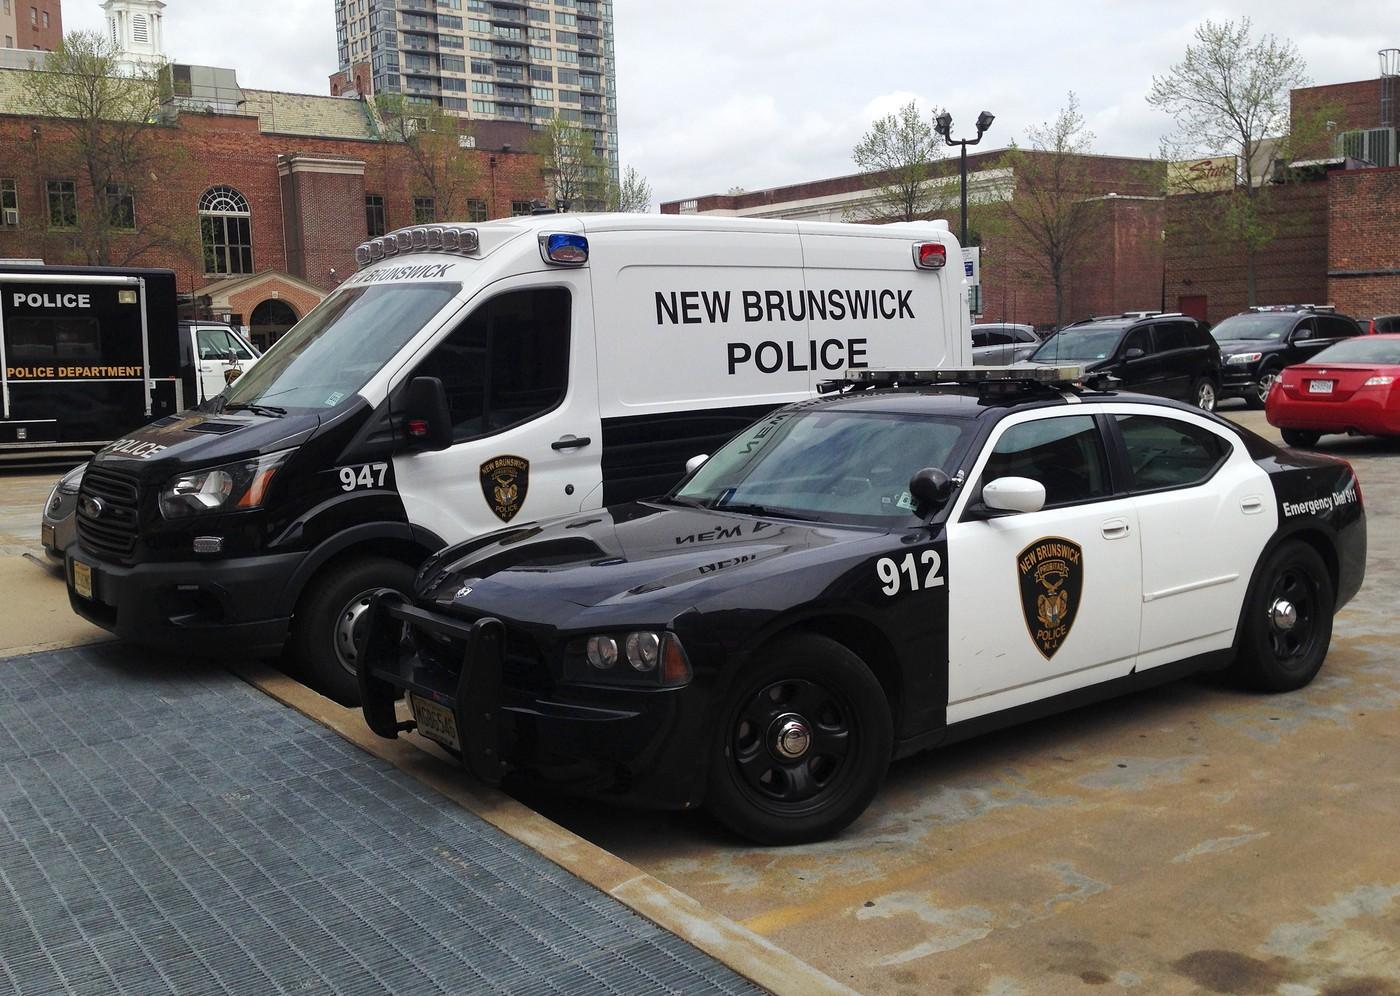 NJ - New Brunswick Police